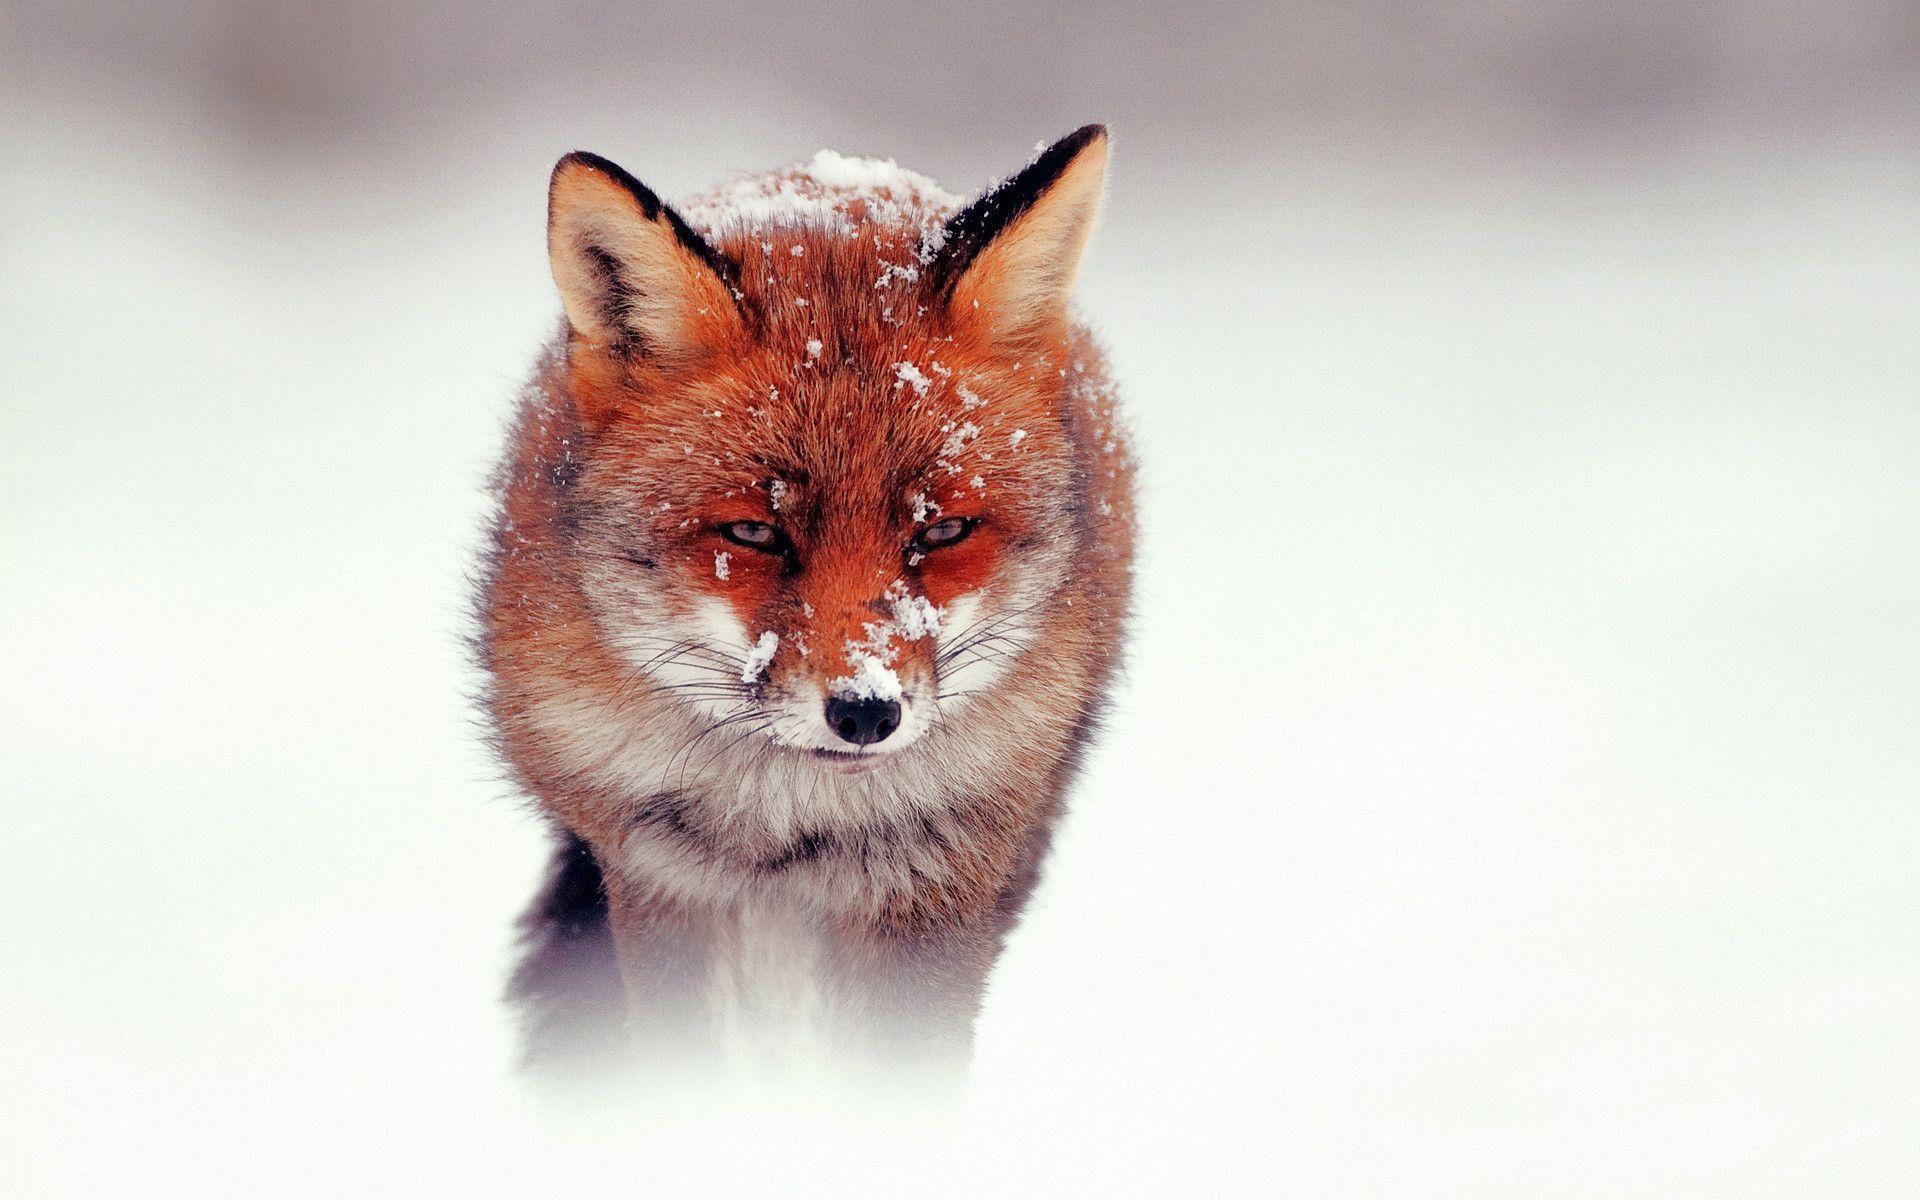 Red Fox Wallpaper 3818 Wallpaper | wallpicsize.